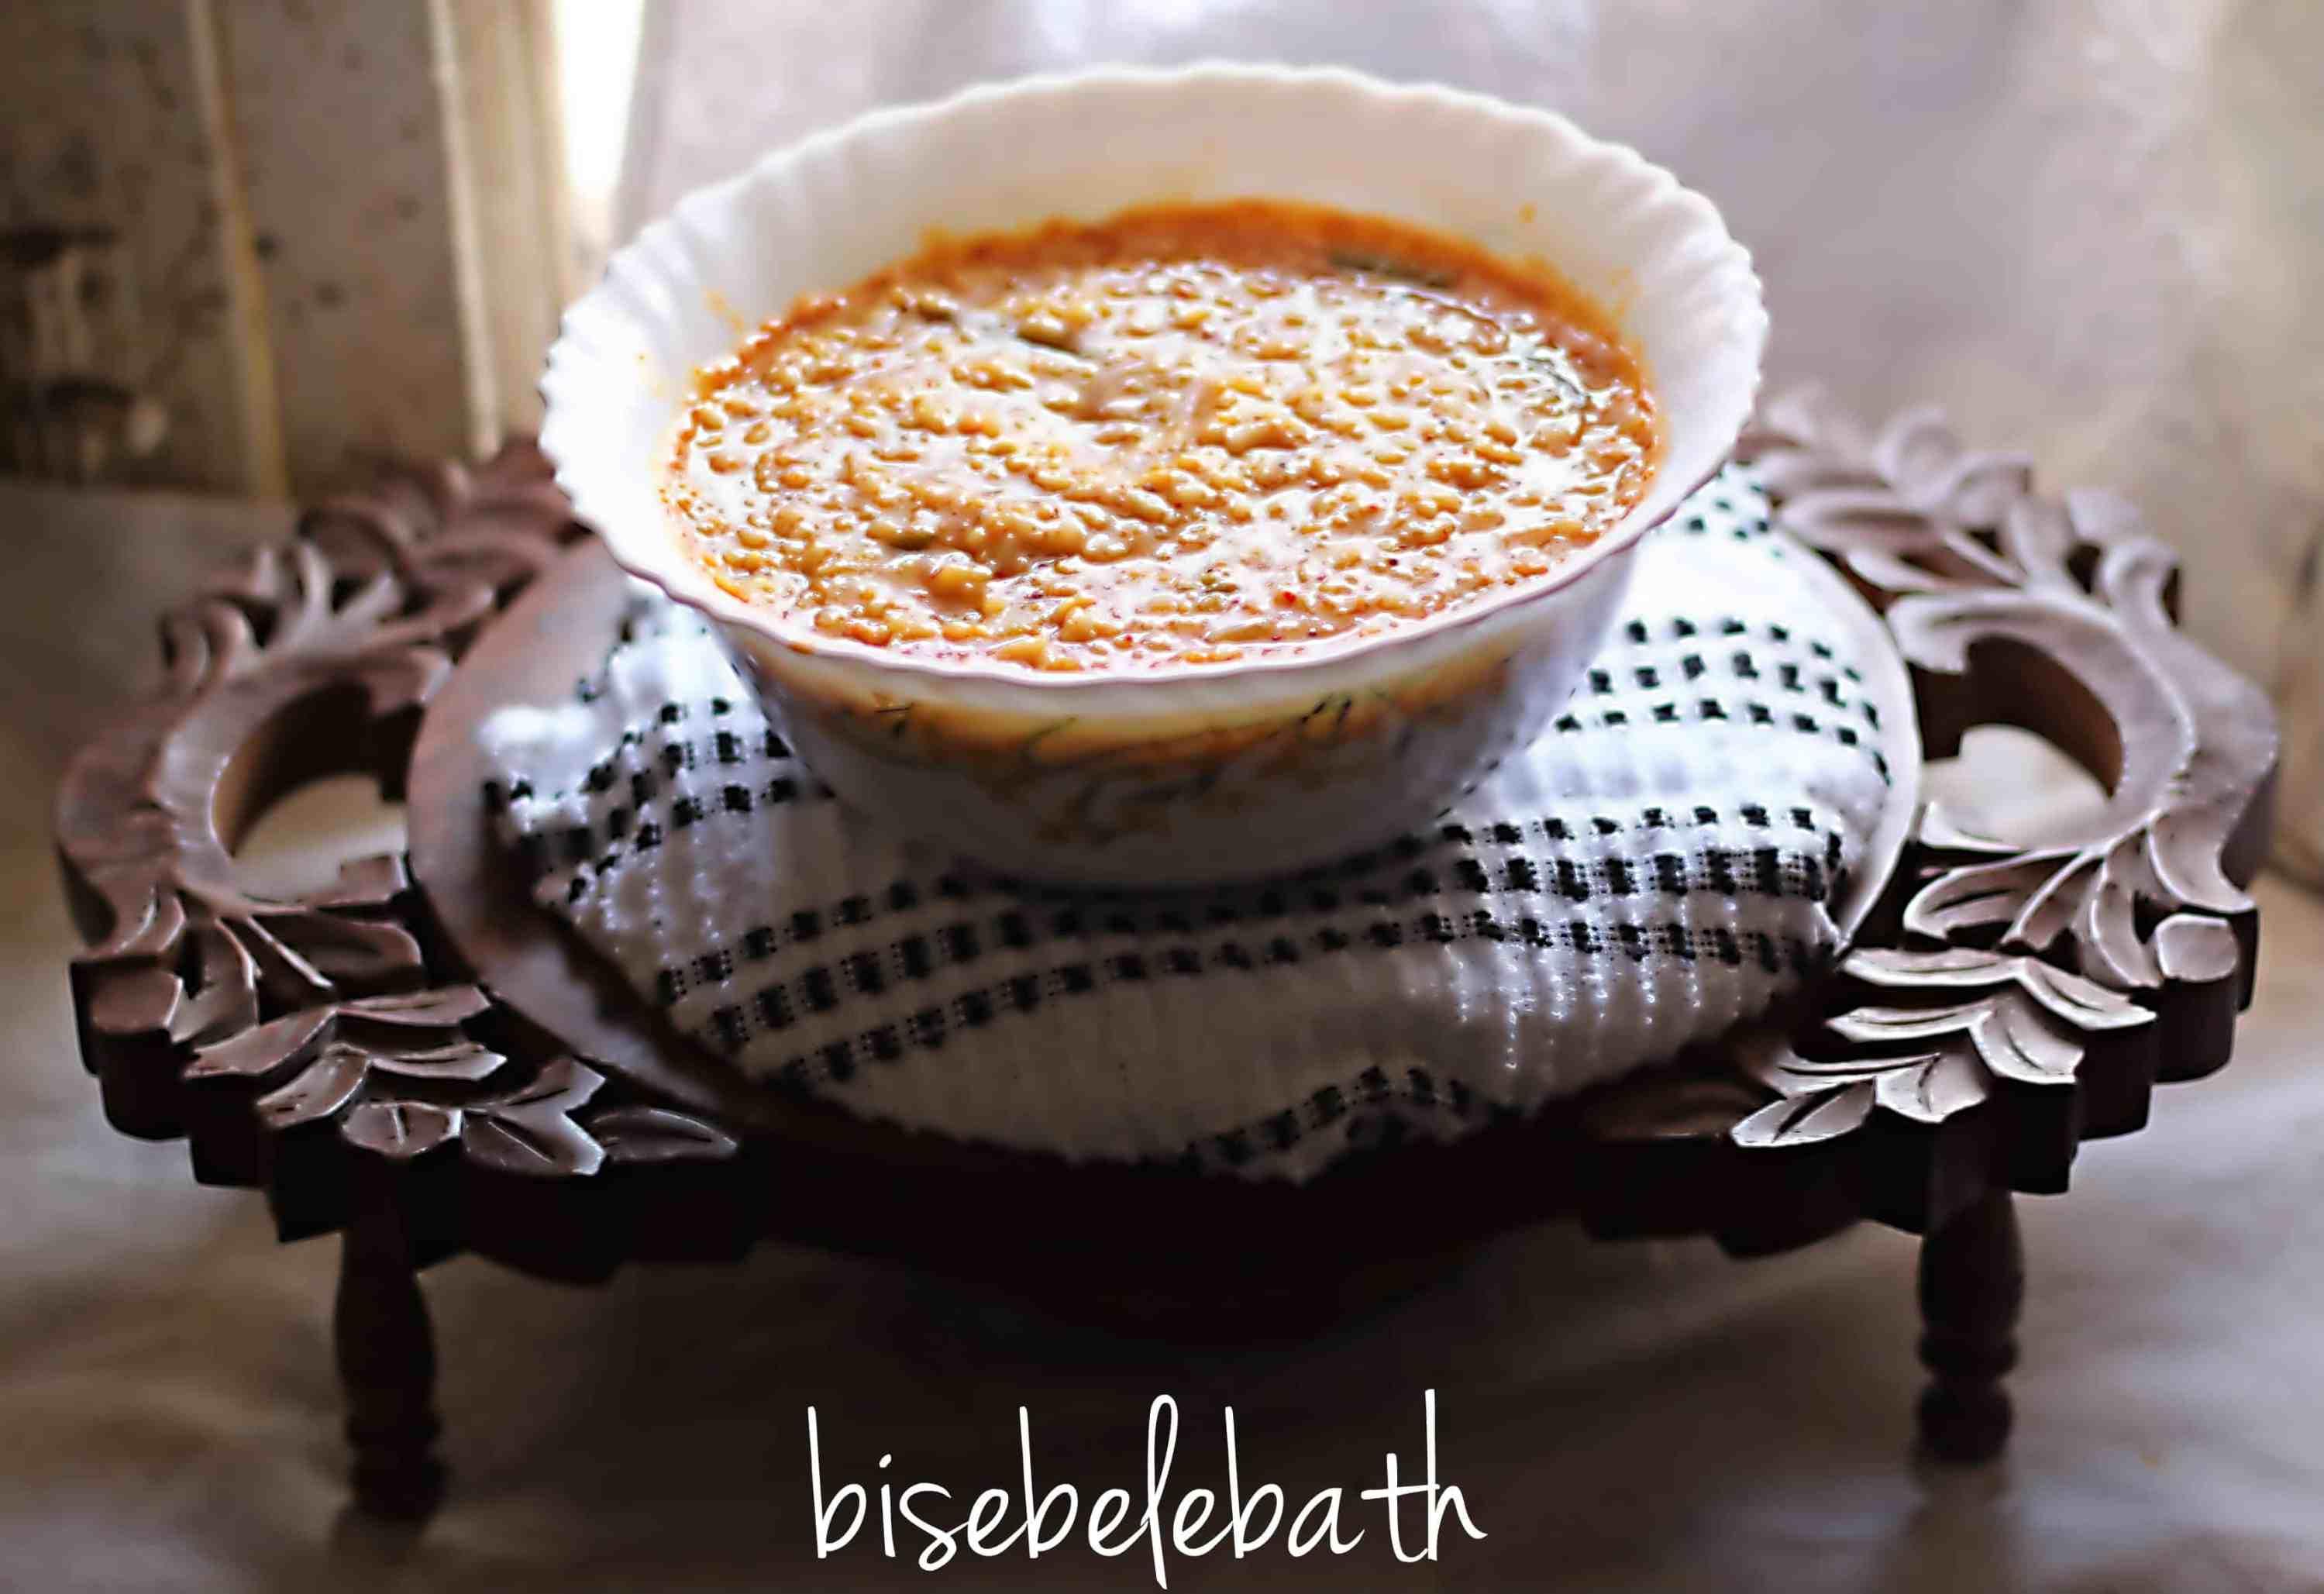 Bisebelebath, popular karnataka recipe